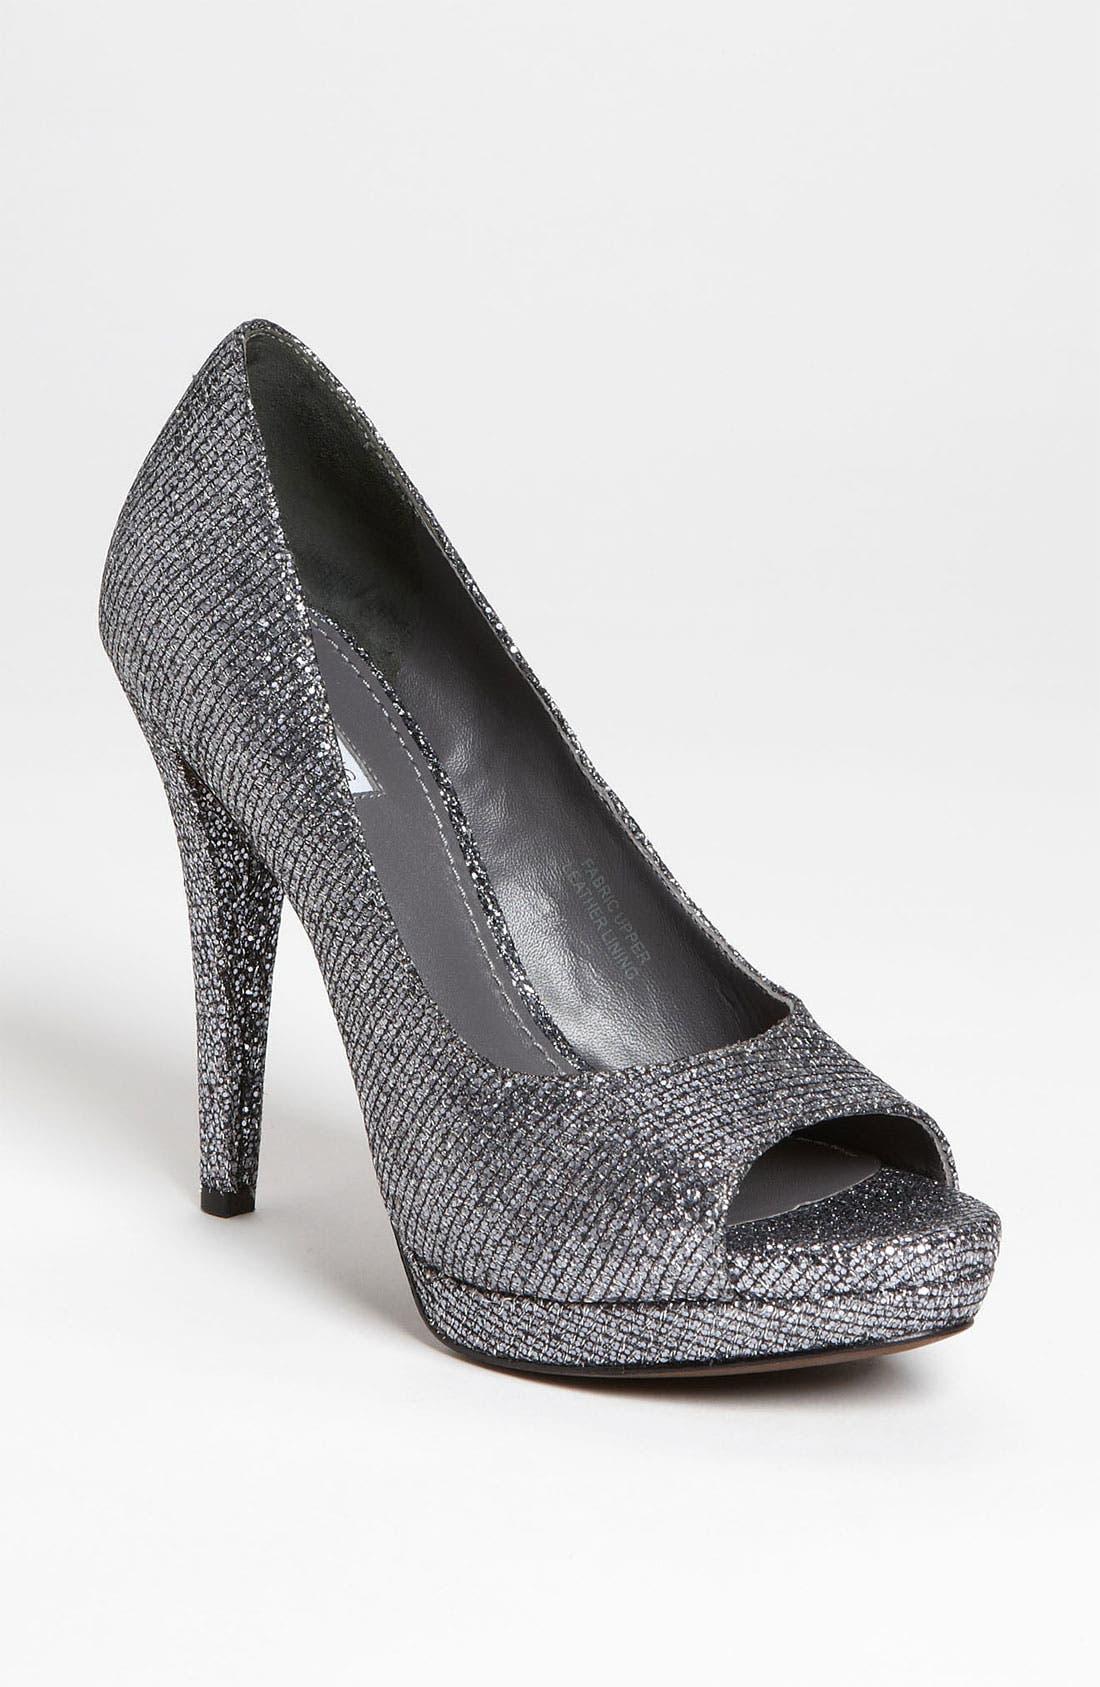 Alternate Image 1 Selected - Vera Wang Footwear 'Selima' Peep Toe Pump